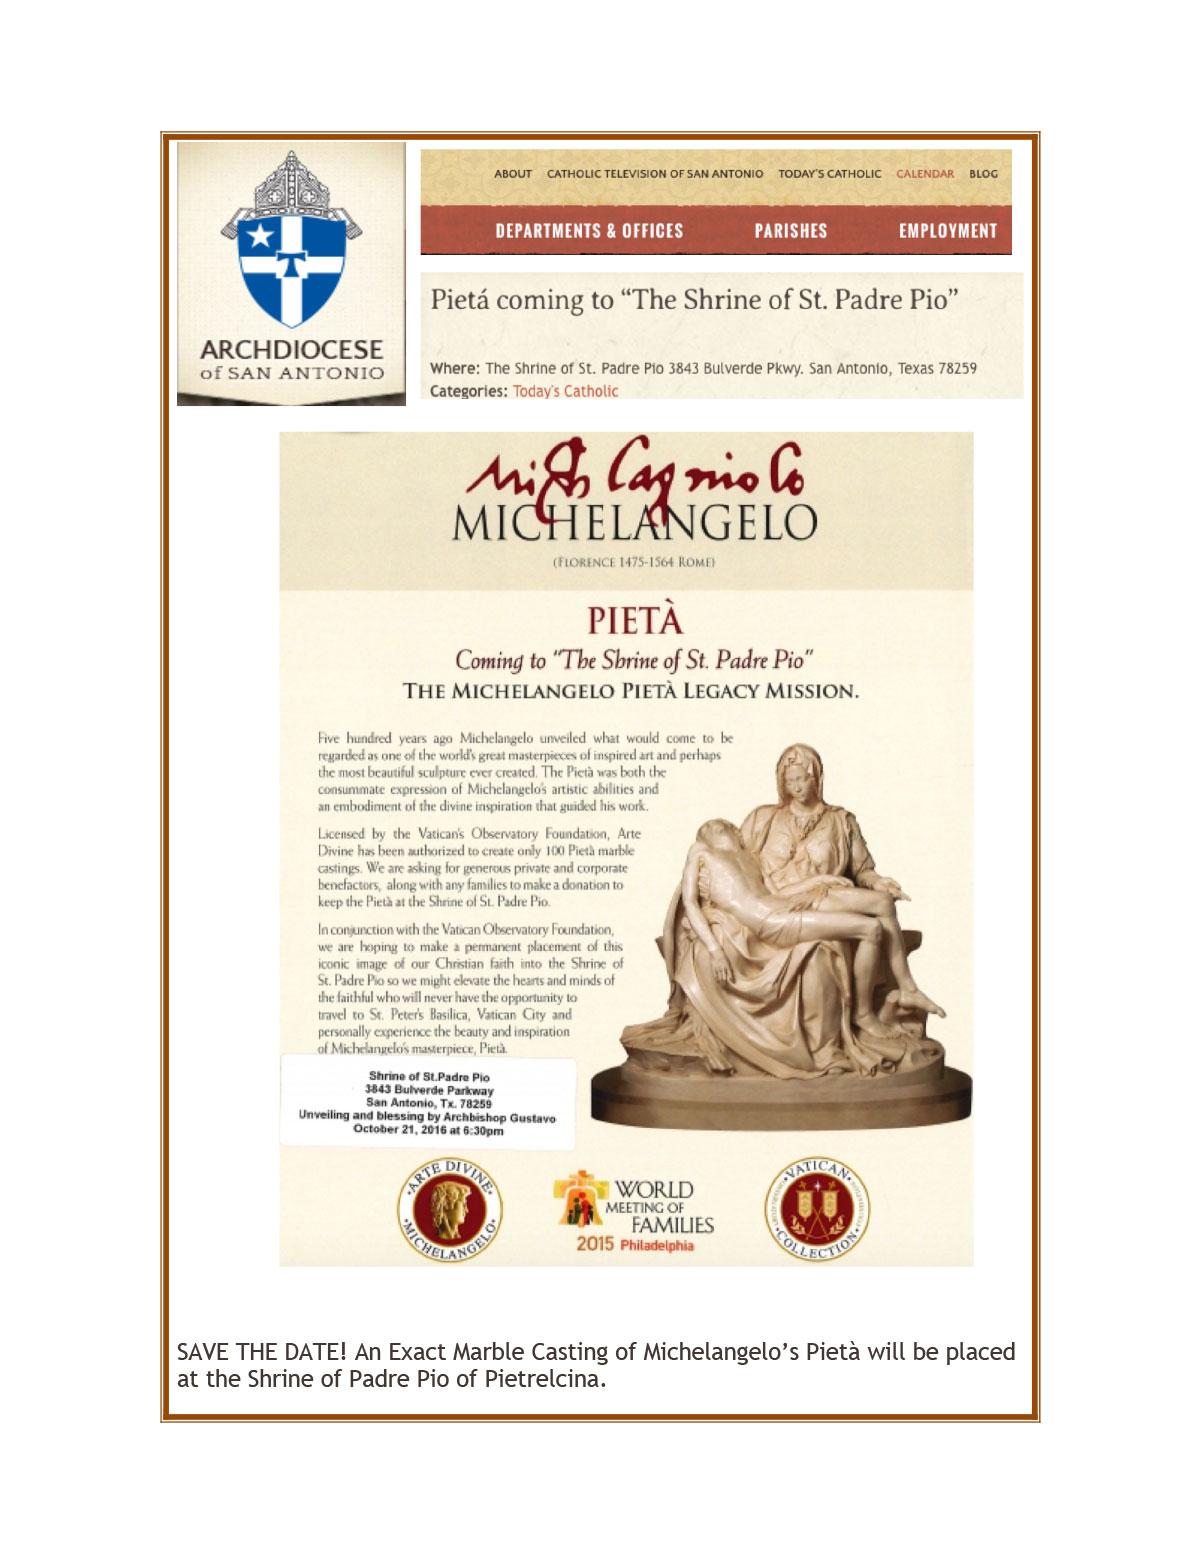 Shrine of Padre Pio, San Antonio, TX. Oct 2016